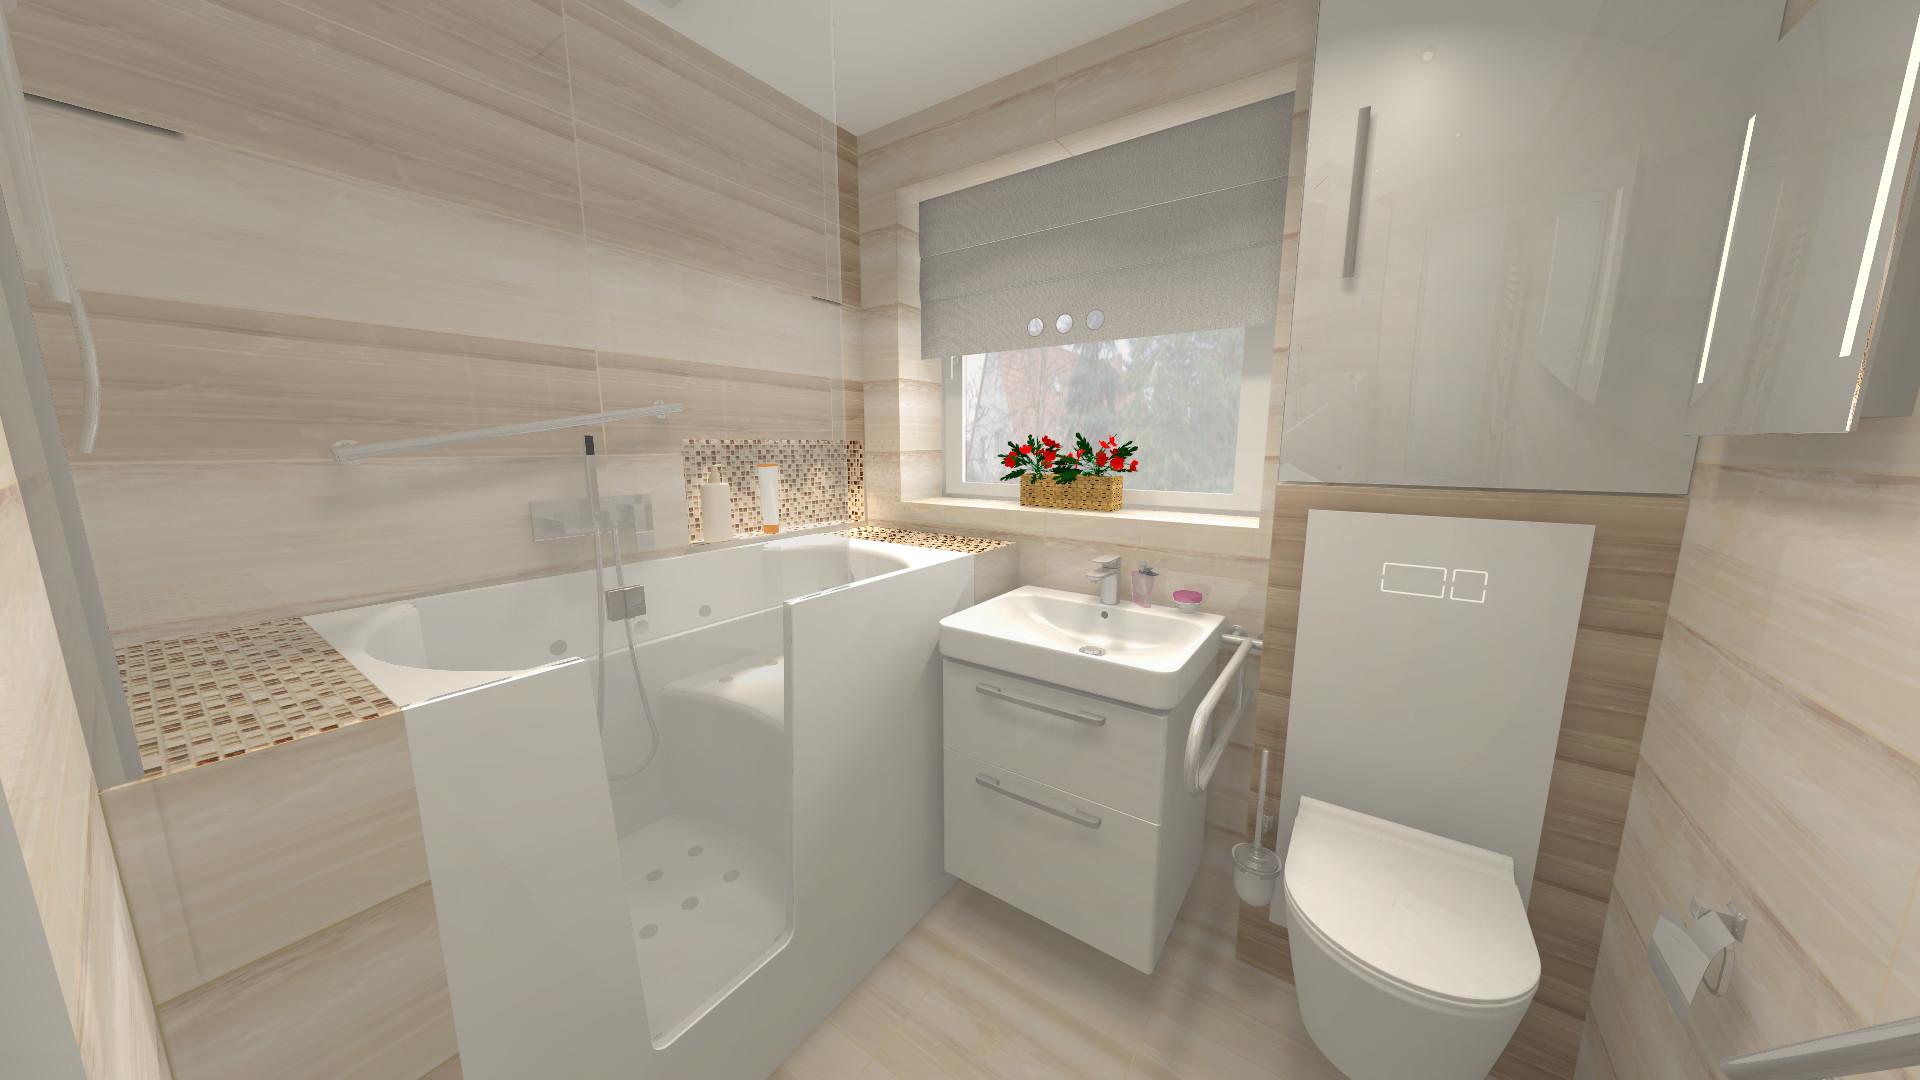 Lukas Kedden - Easy Access Bath